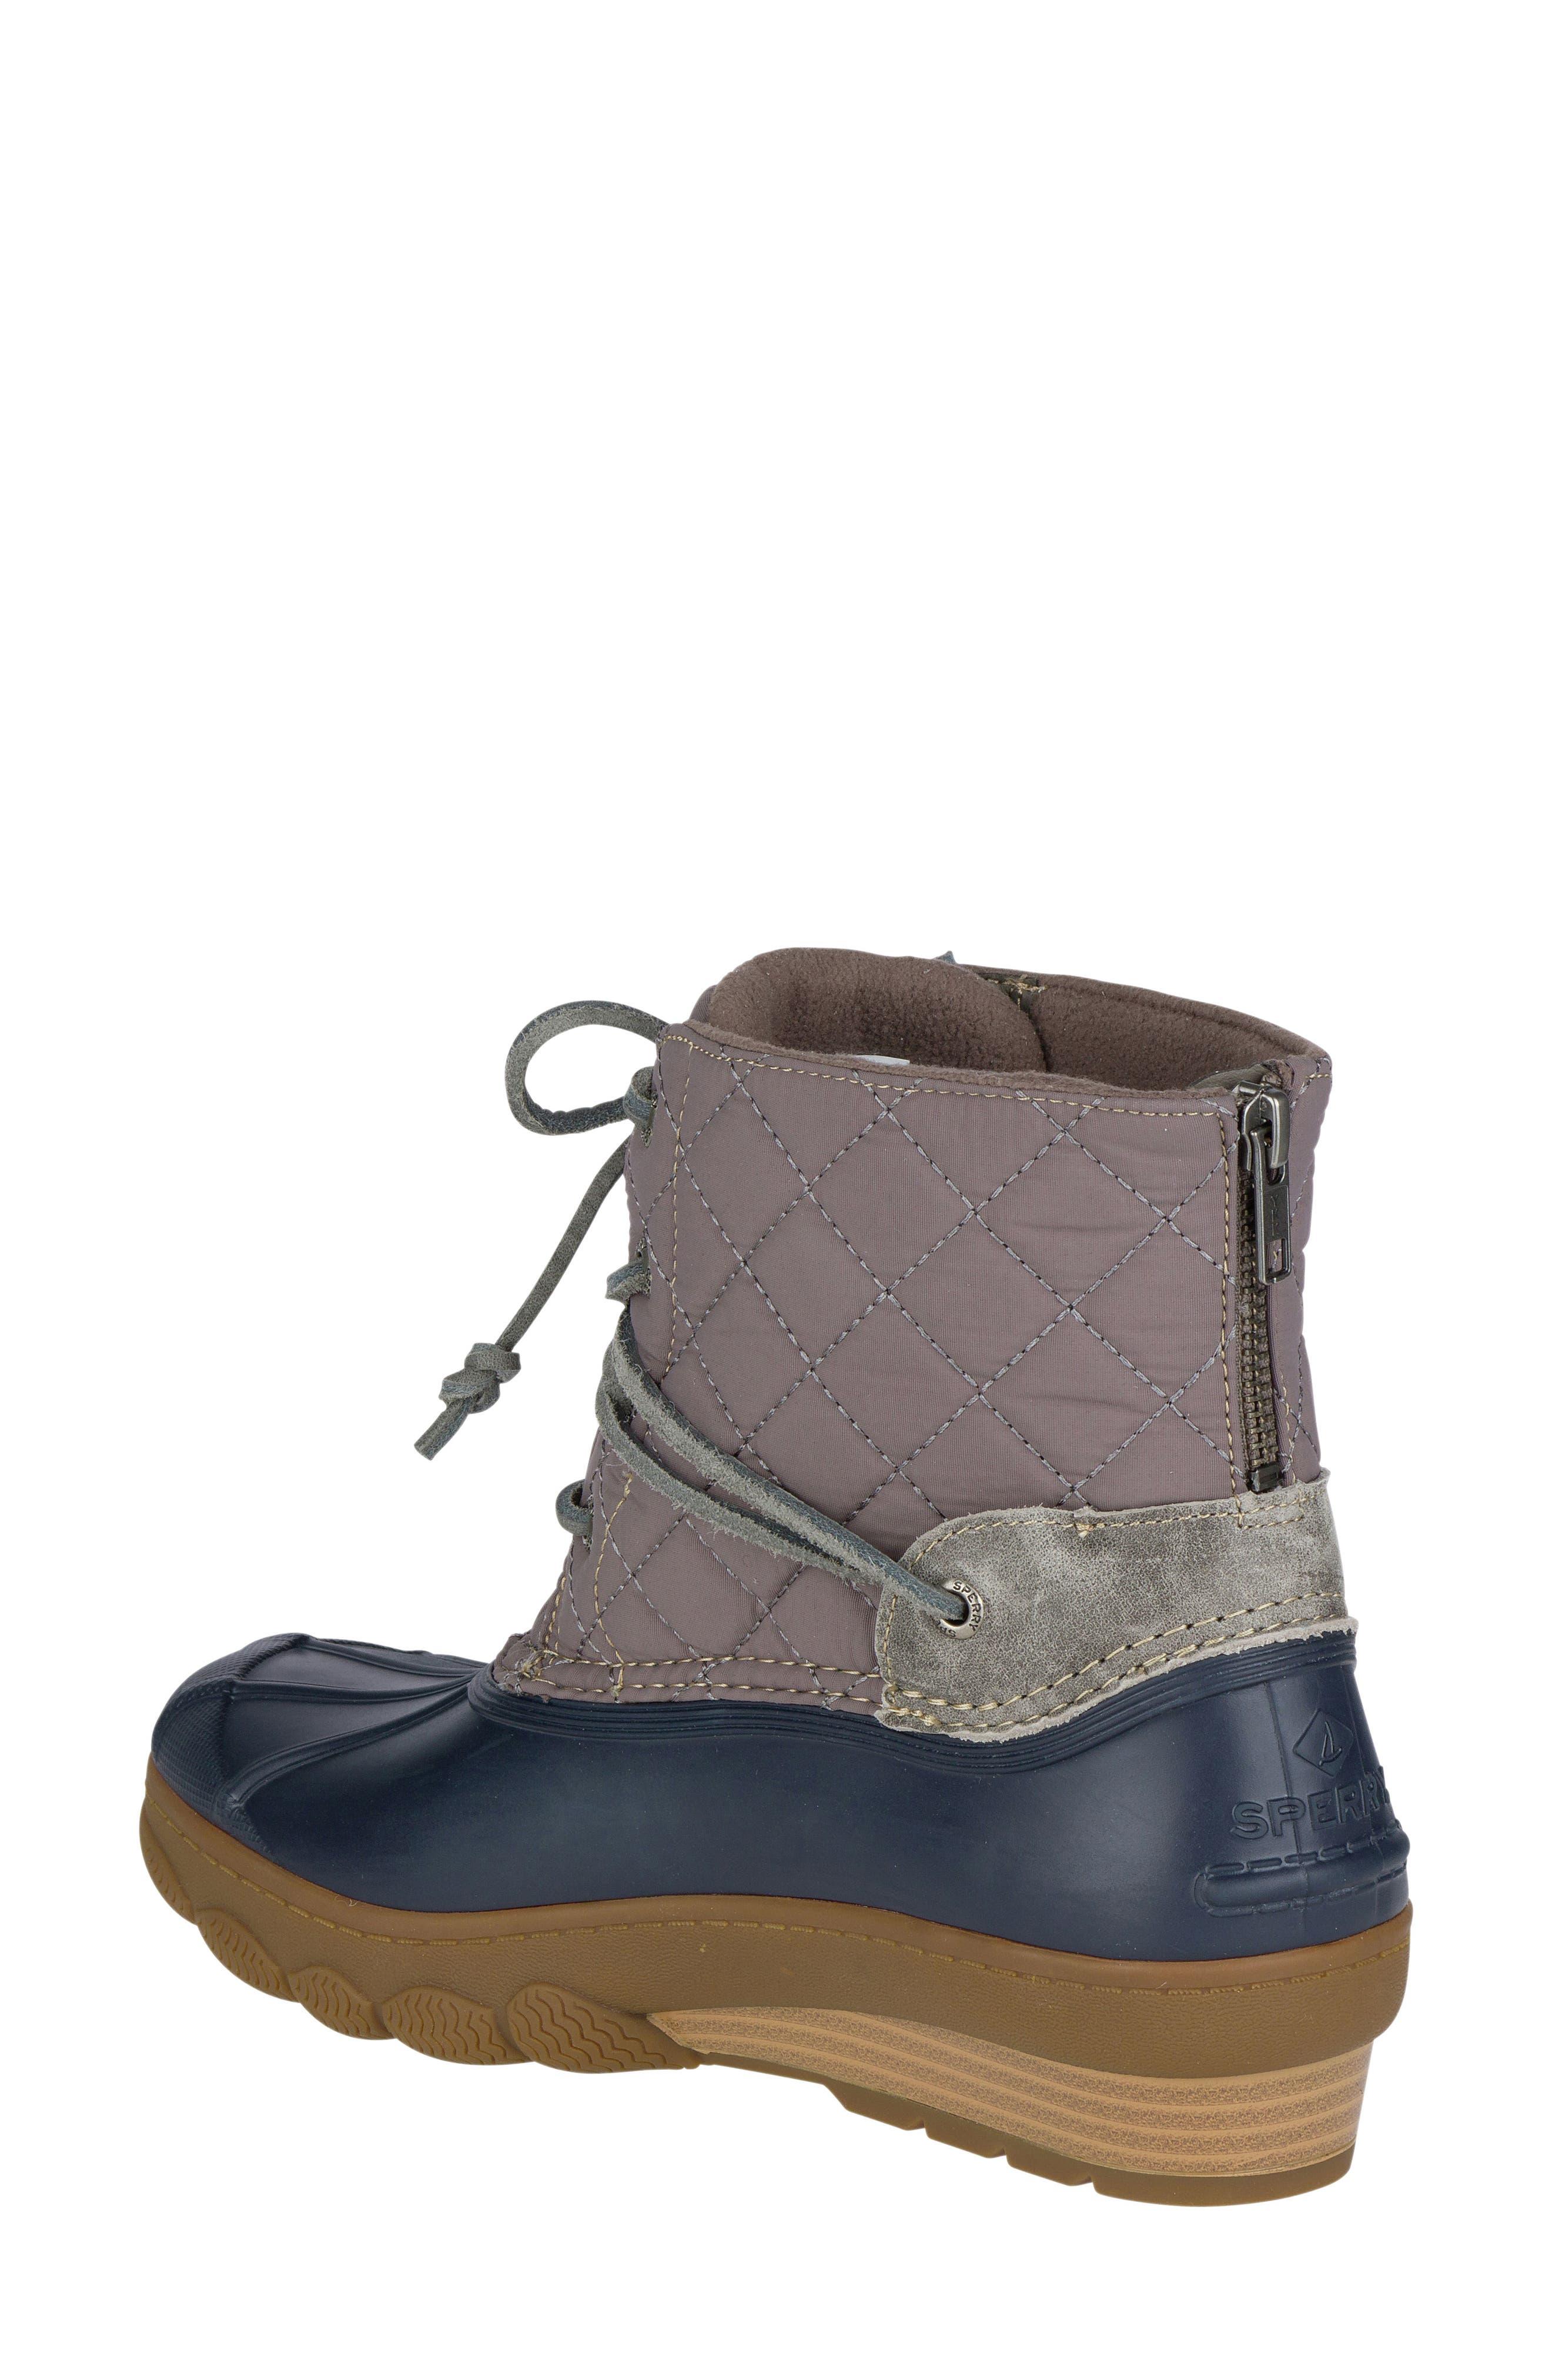 Alternate Image 2  - Sperry Saltwater Quilted Watperproof Boot (Women)